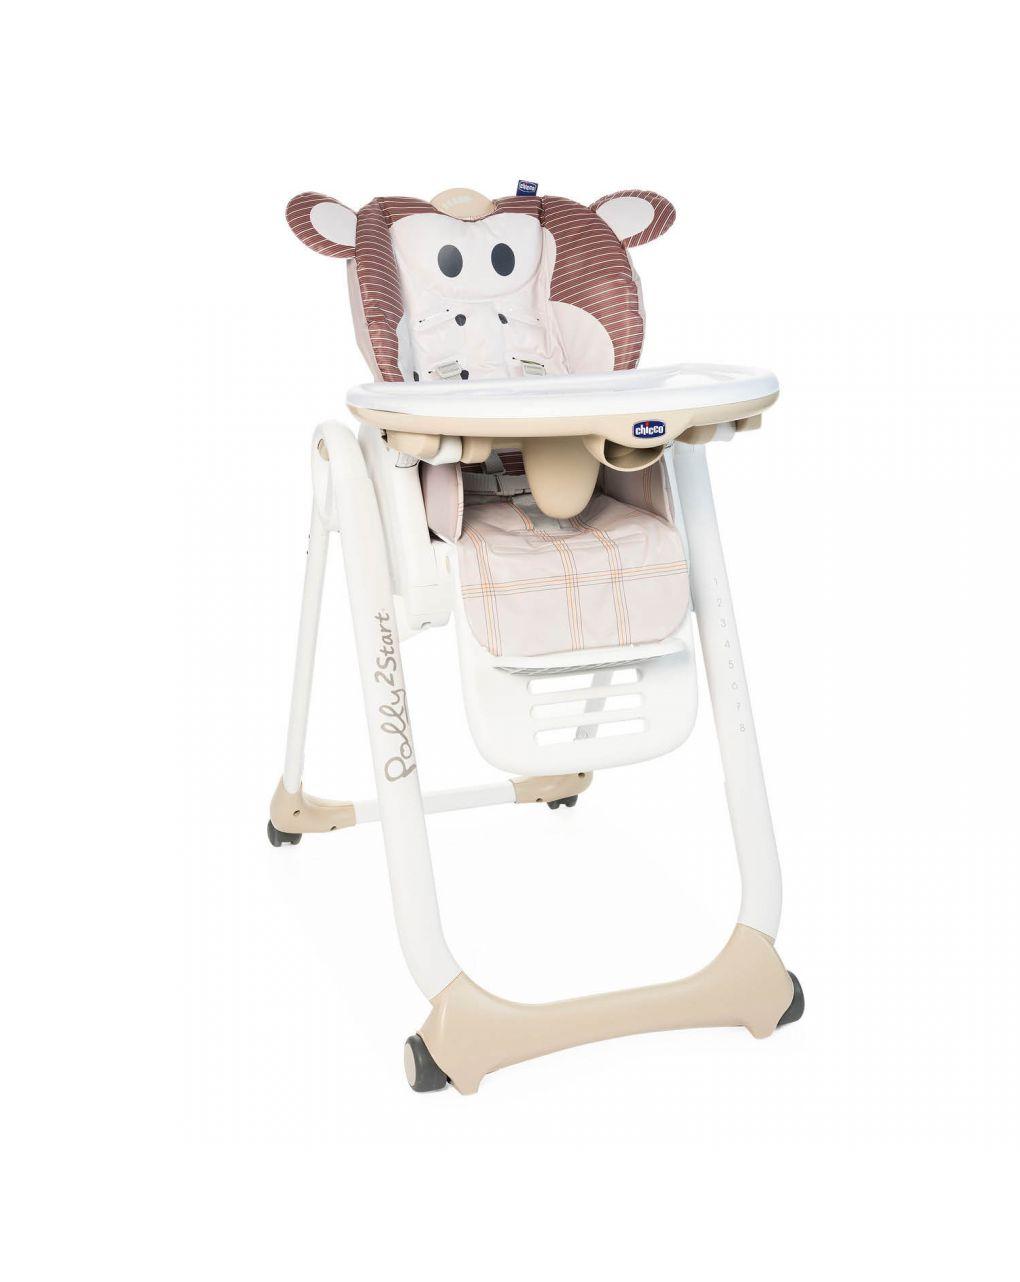 Cadeira alta chicco polly2start monkey - Chicco